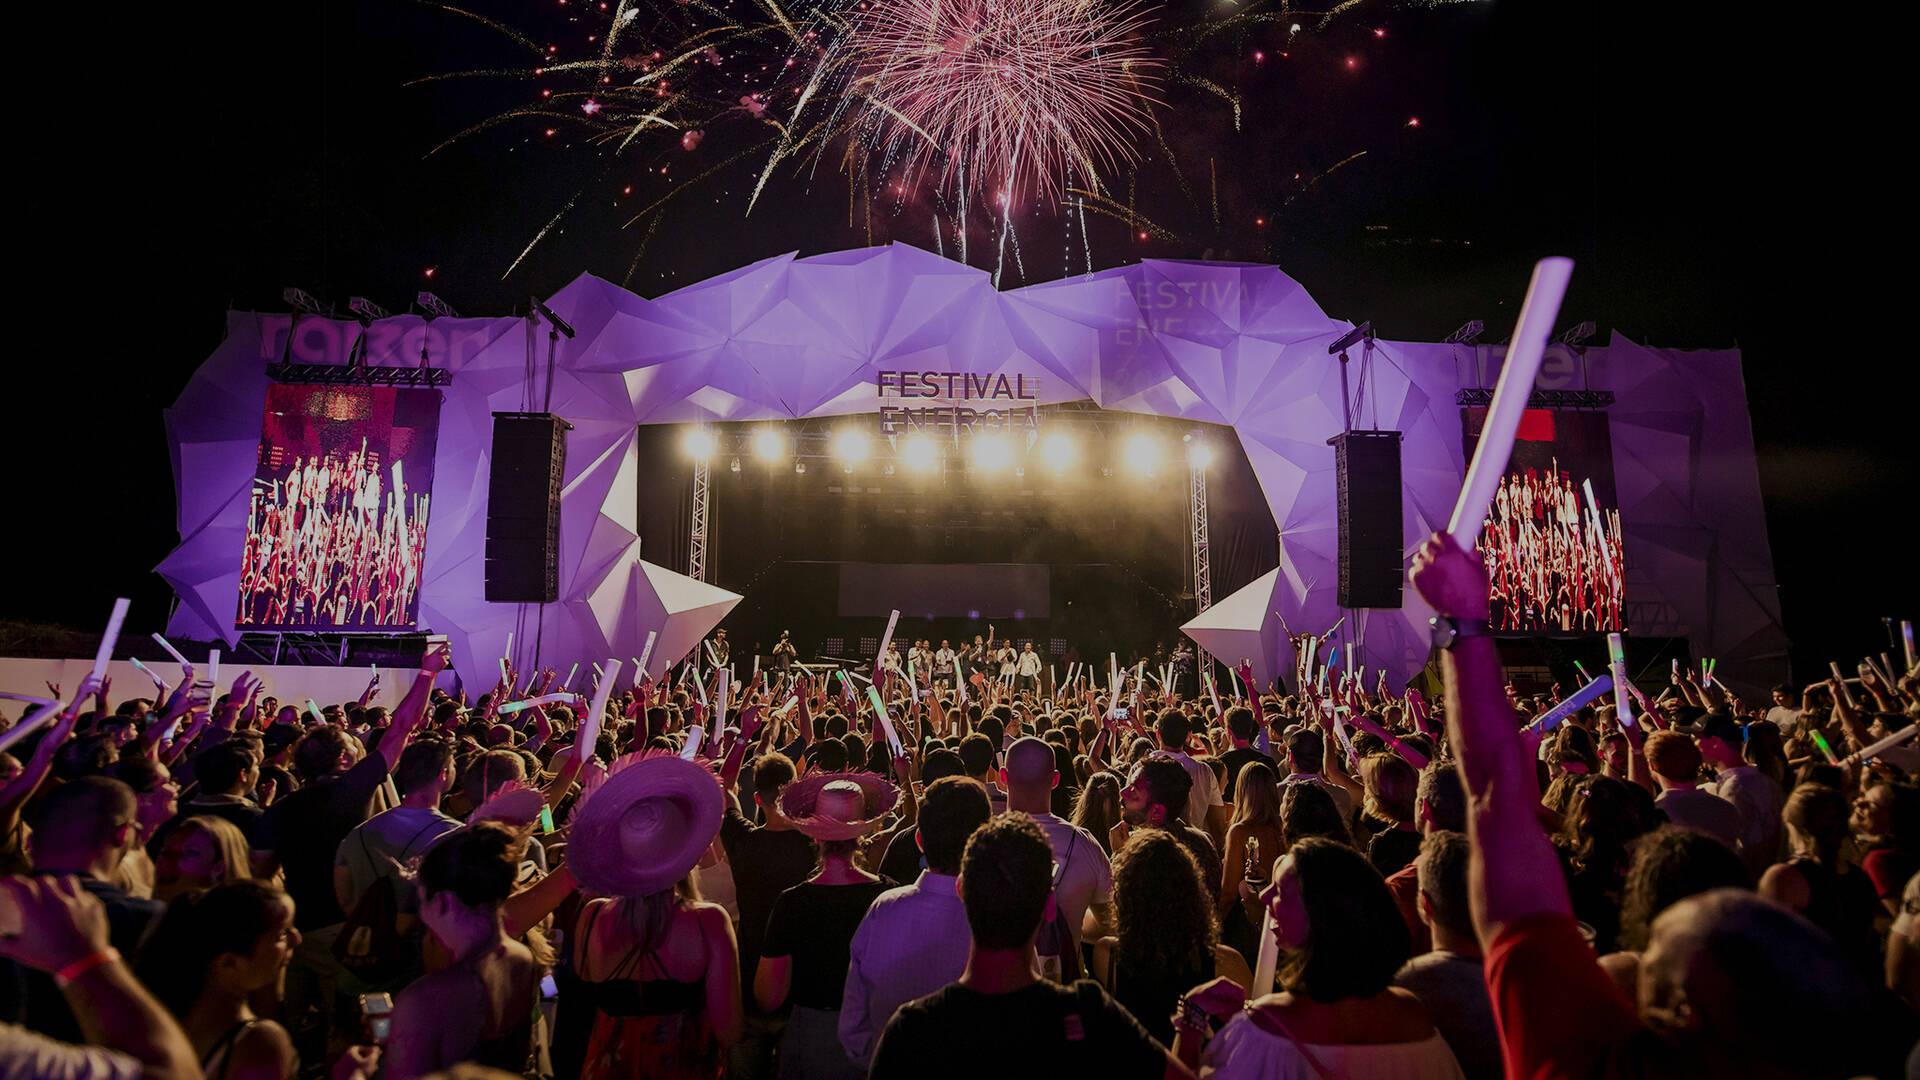 Festa de Fim de Ano de Festival Energia Raizen